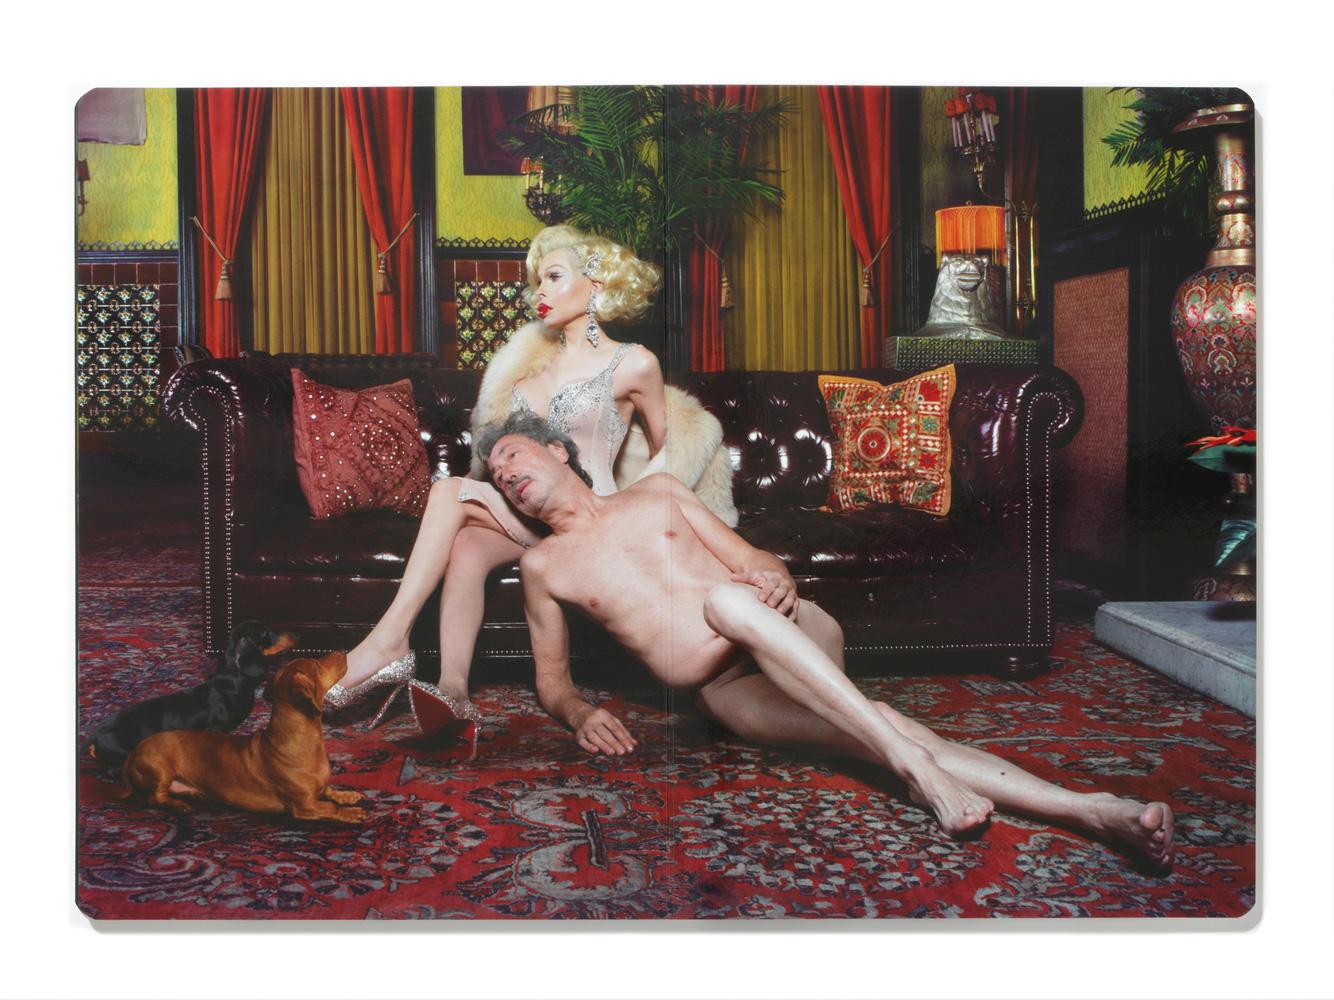 elias-wessel, amanda-lepore, amanda-lepore-photography-book, photography, arts